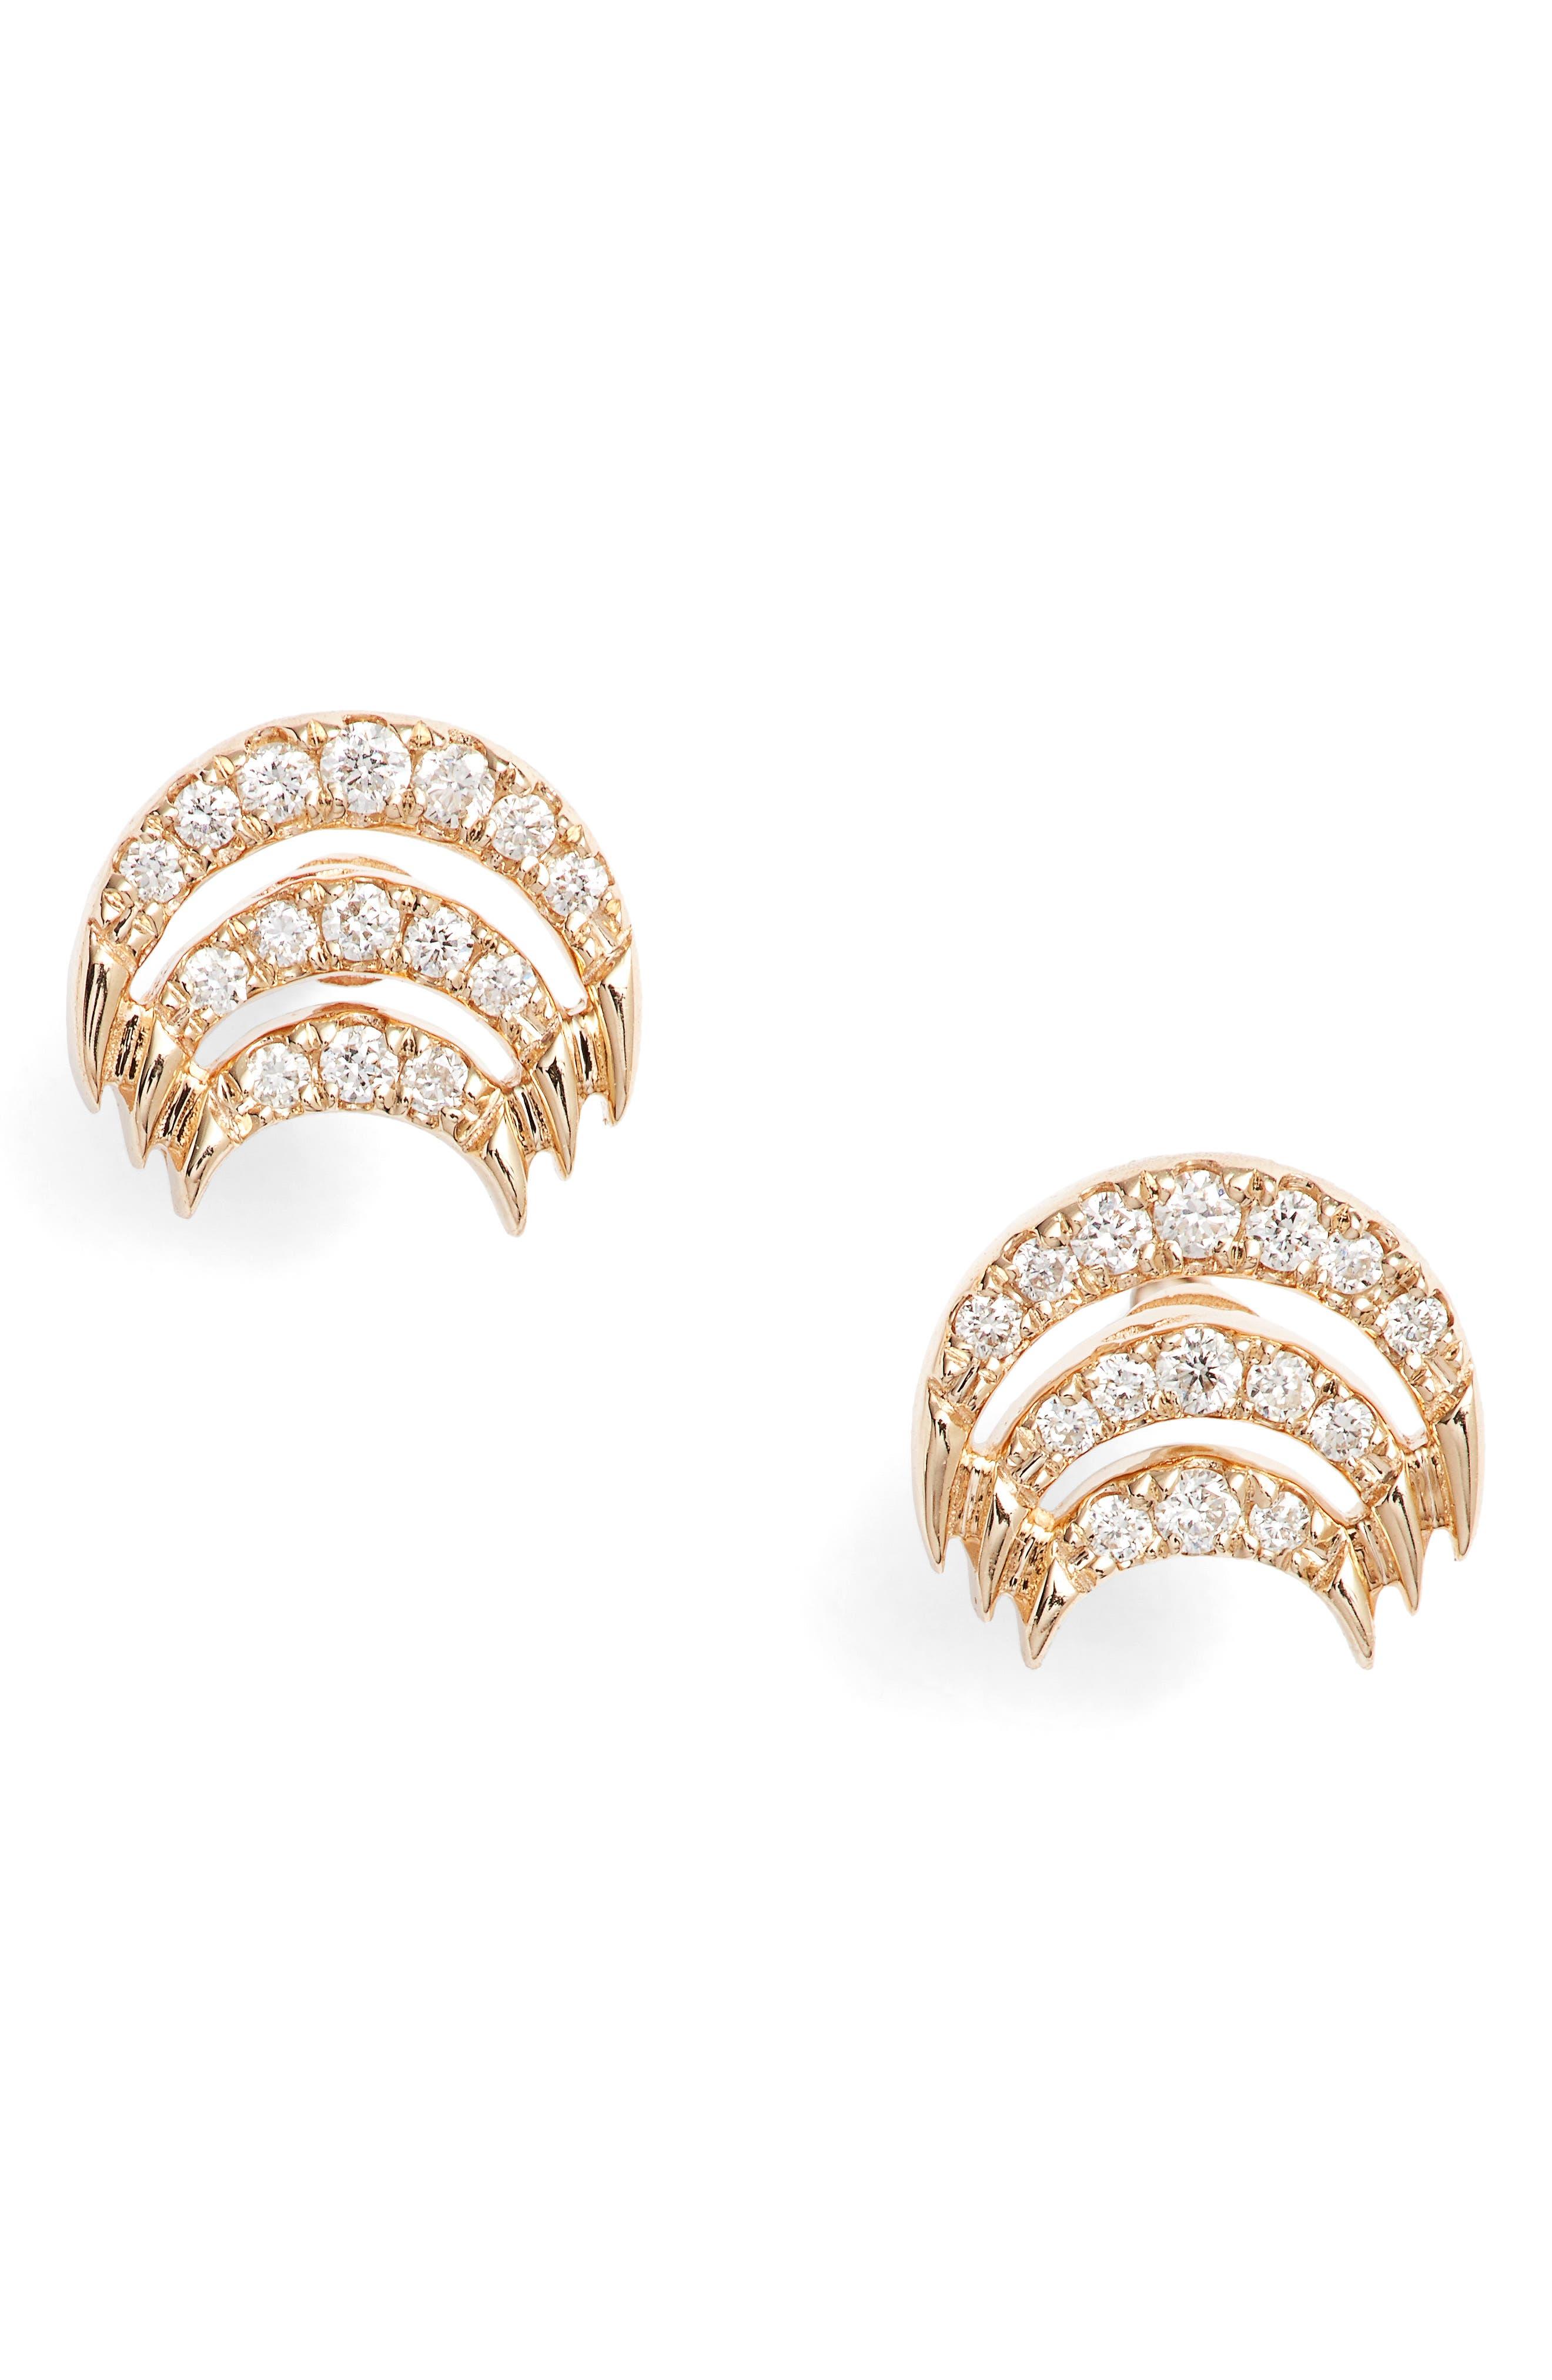 Isla Rio Diamond Stud Earrings,                         Main,                         color,